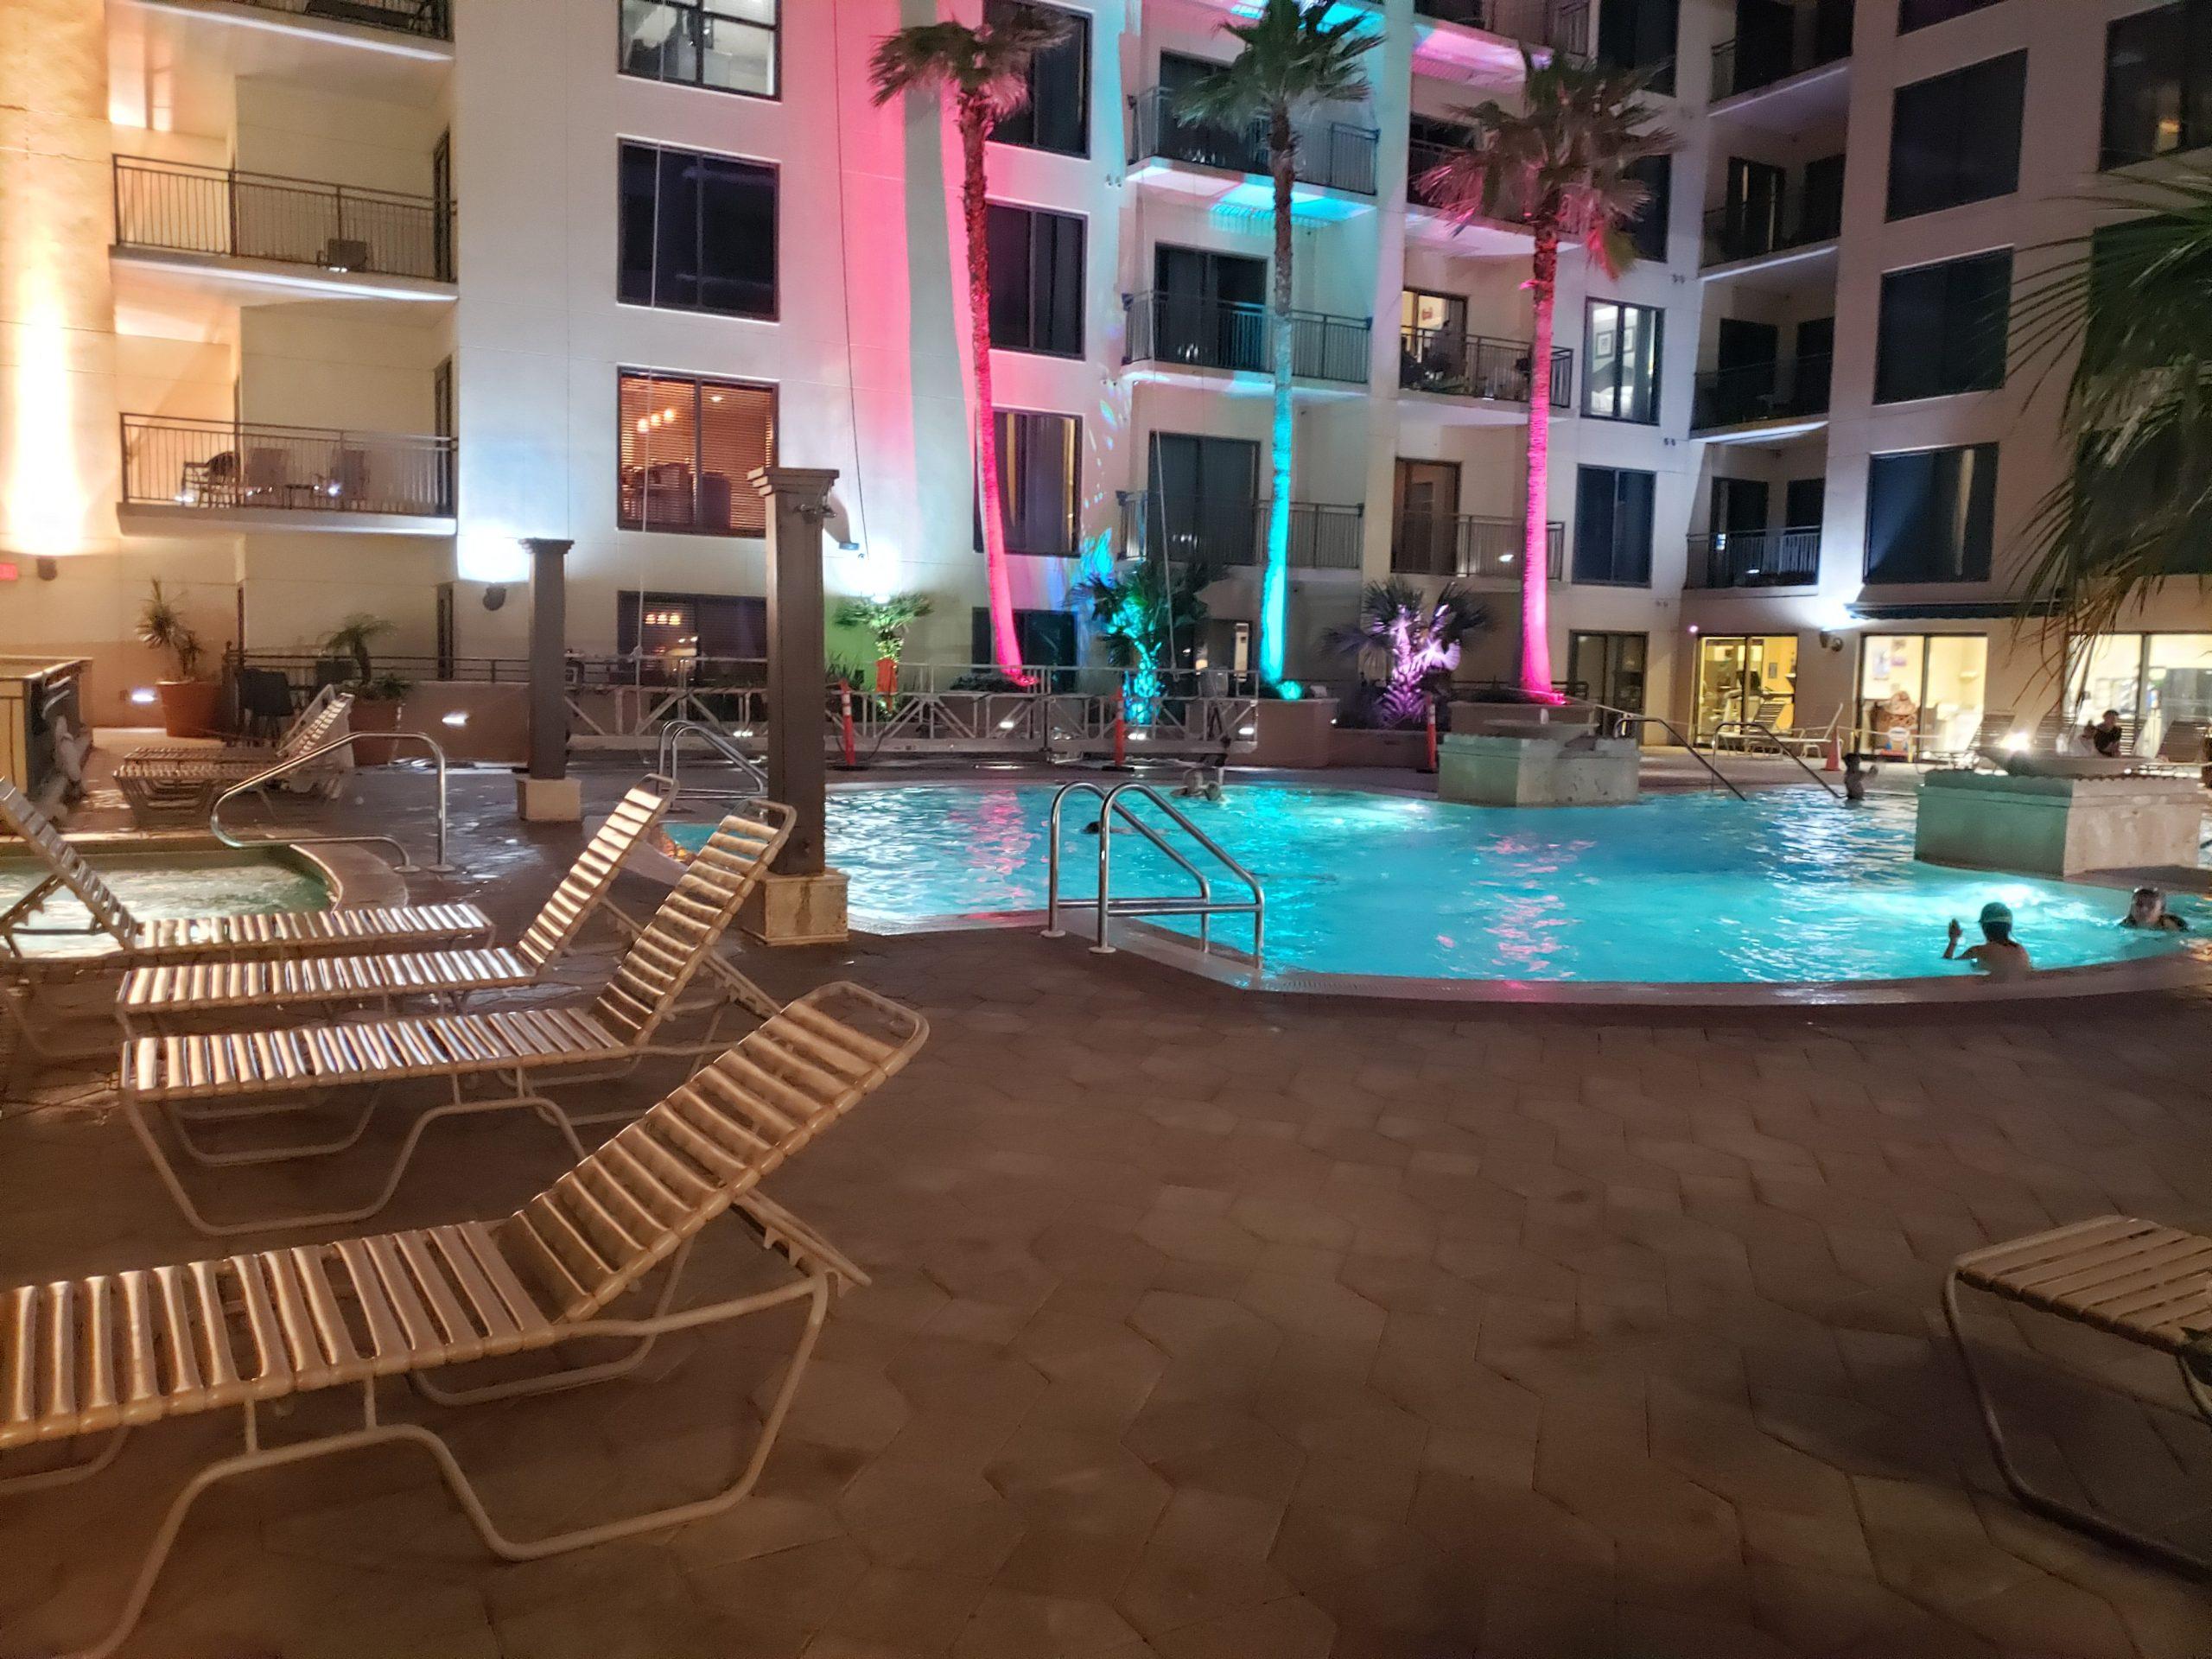 Origin Panama City Beach, Florida